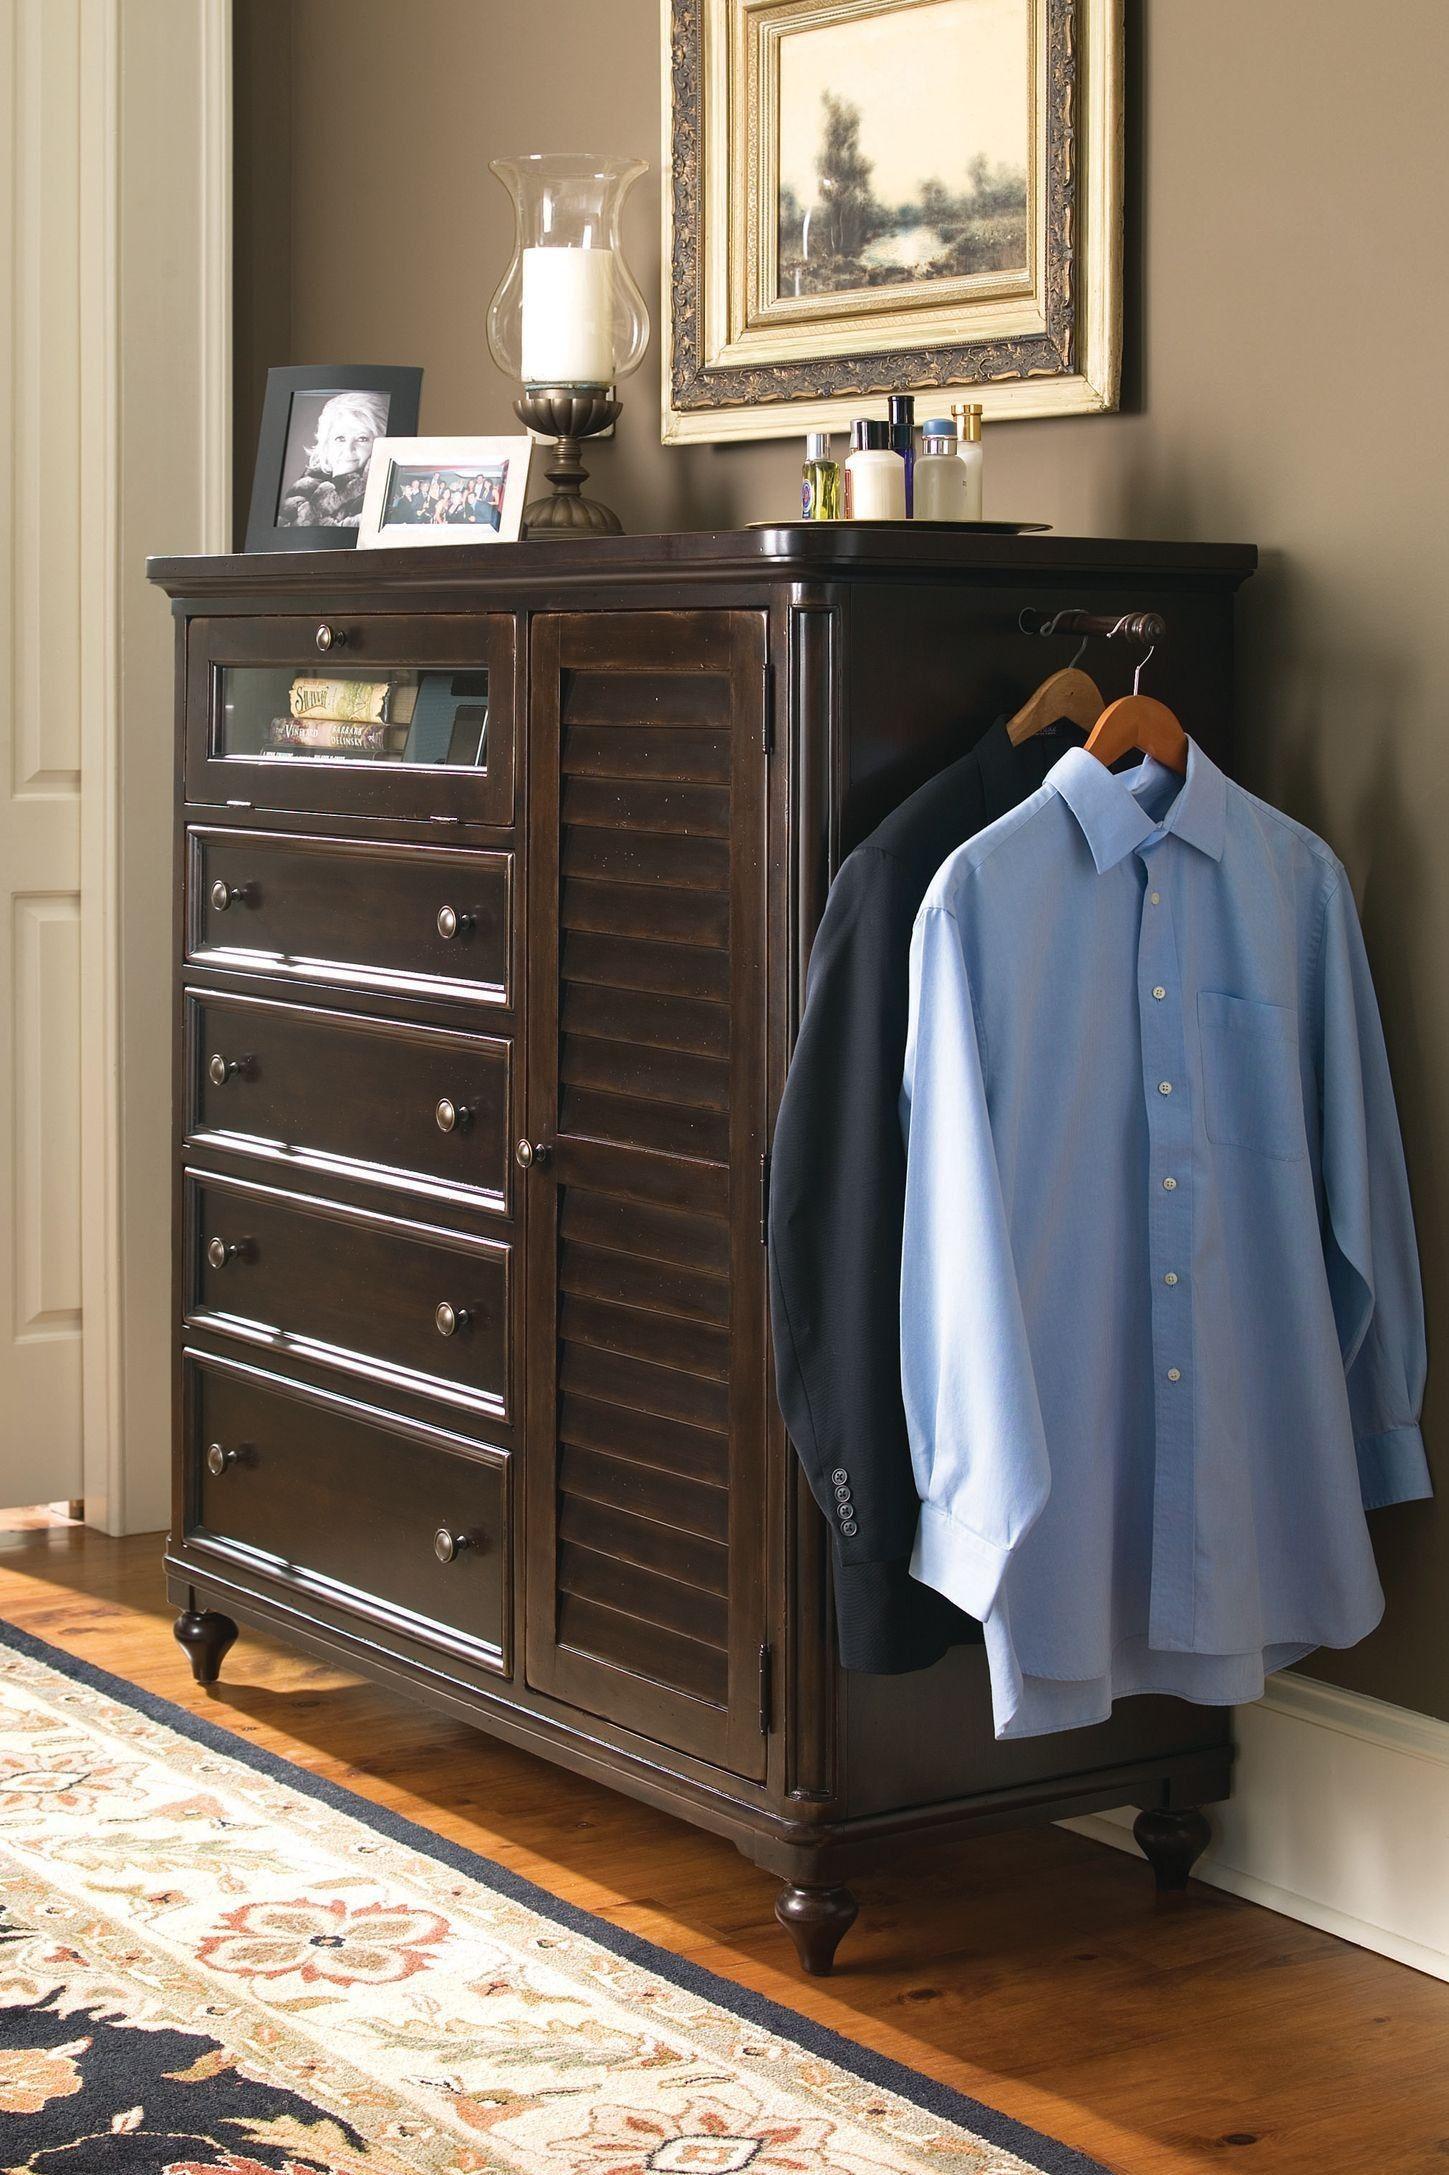 paula deen home tobacco 4 drawer door chest home decor redeux